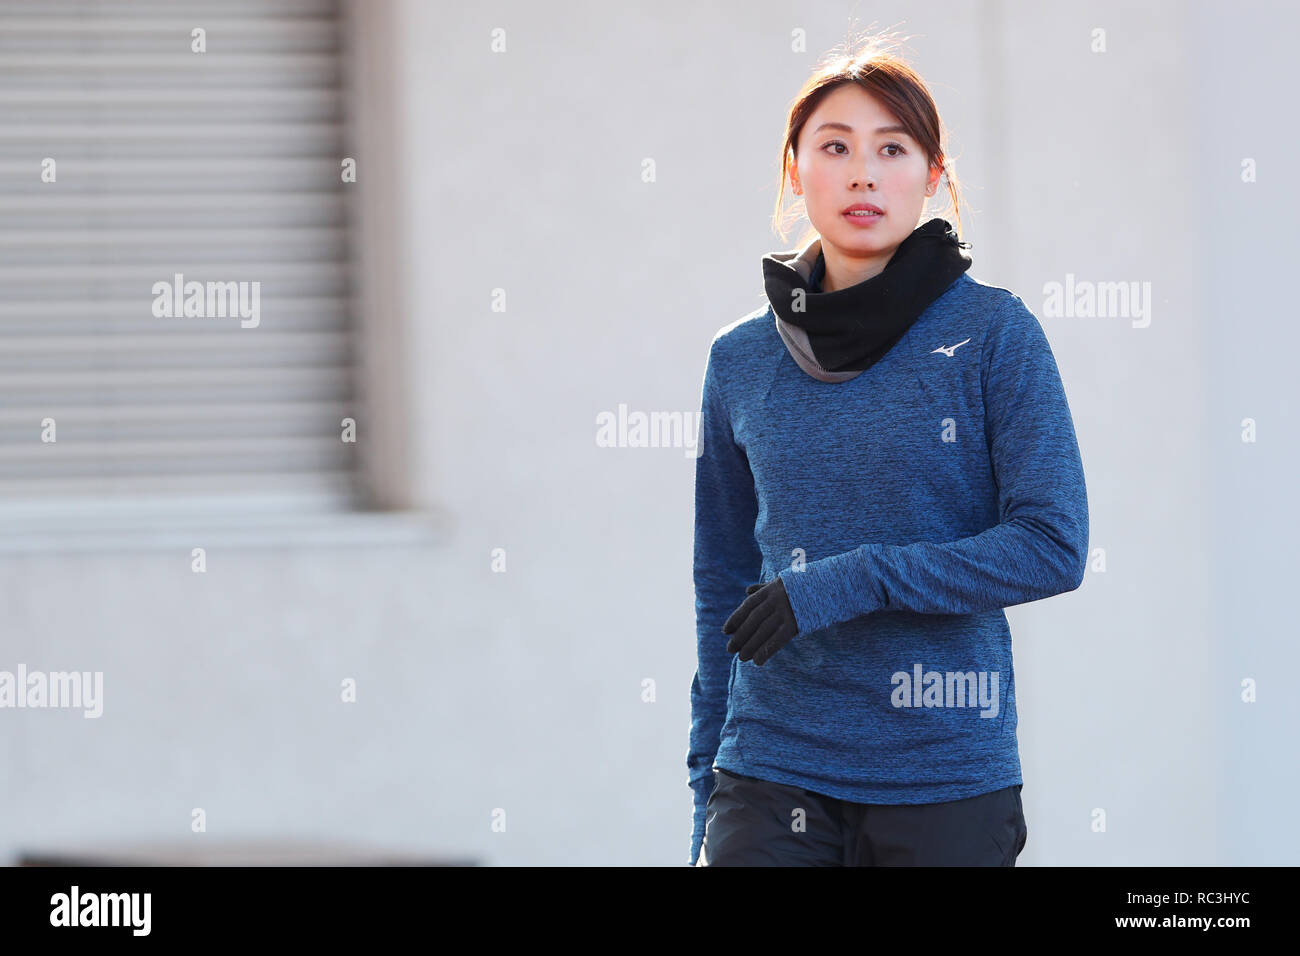 Tokyo, Japan. 13th Jan, 2019. Kana Ichikawa Athletics : JAAF women's relay sprinter selection at Ajinomoto national training cener athletis field in Tokyo, Japan . Credit: Yohei Osada/AFLO SPORT/Alamy Live News - Stock Image